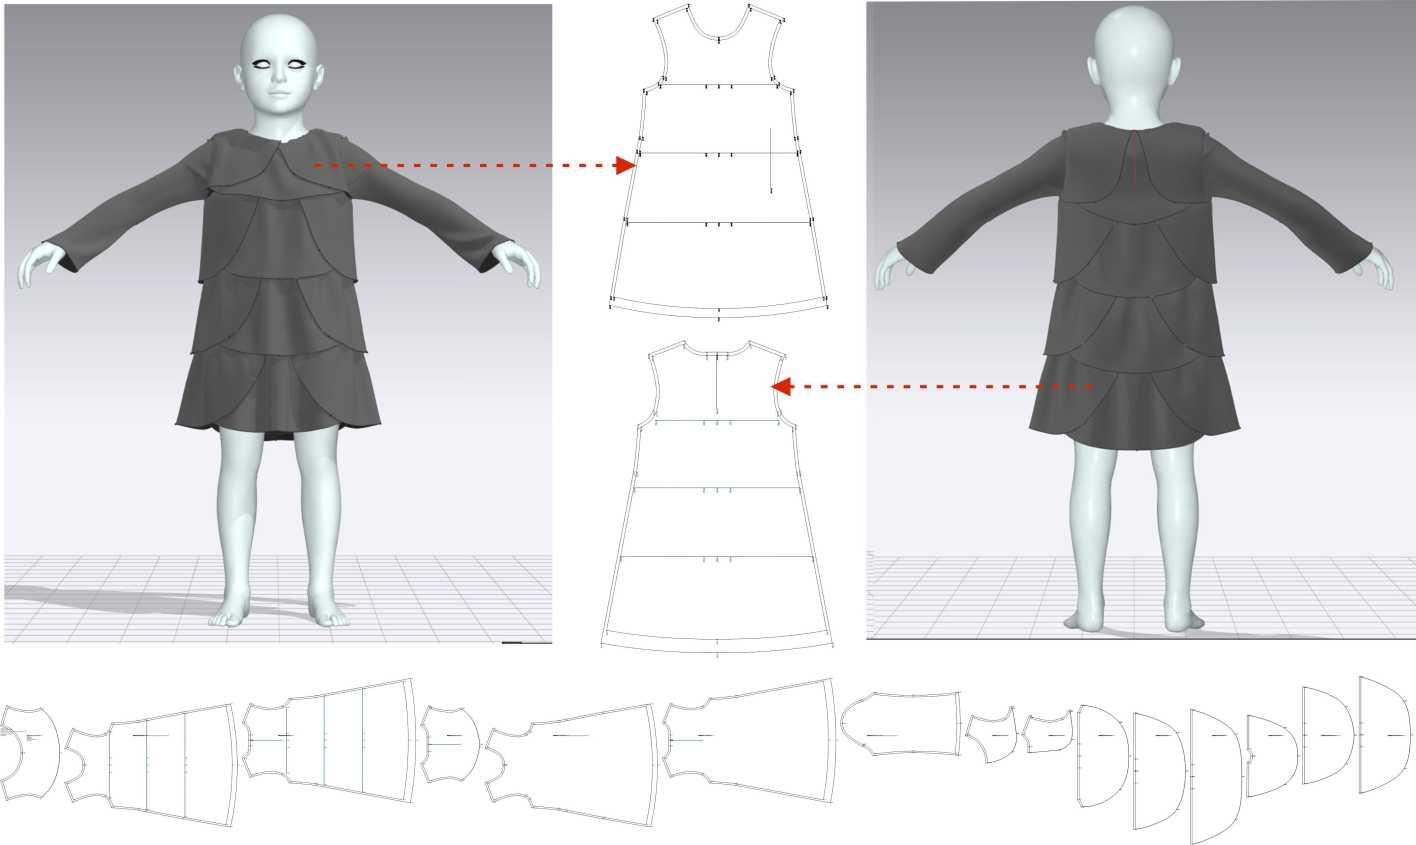 Modelo 3D en ordenador de la prenda